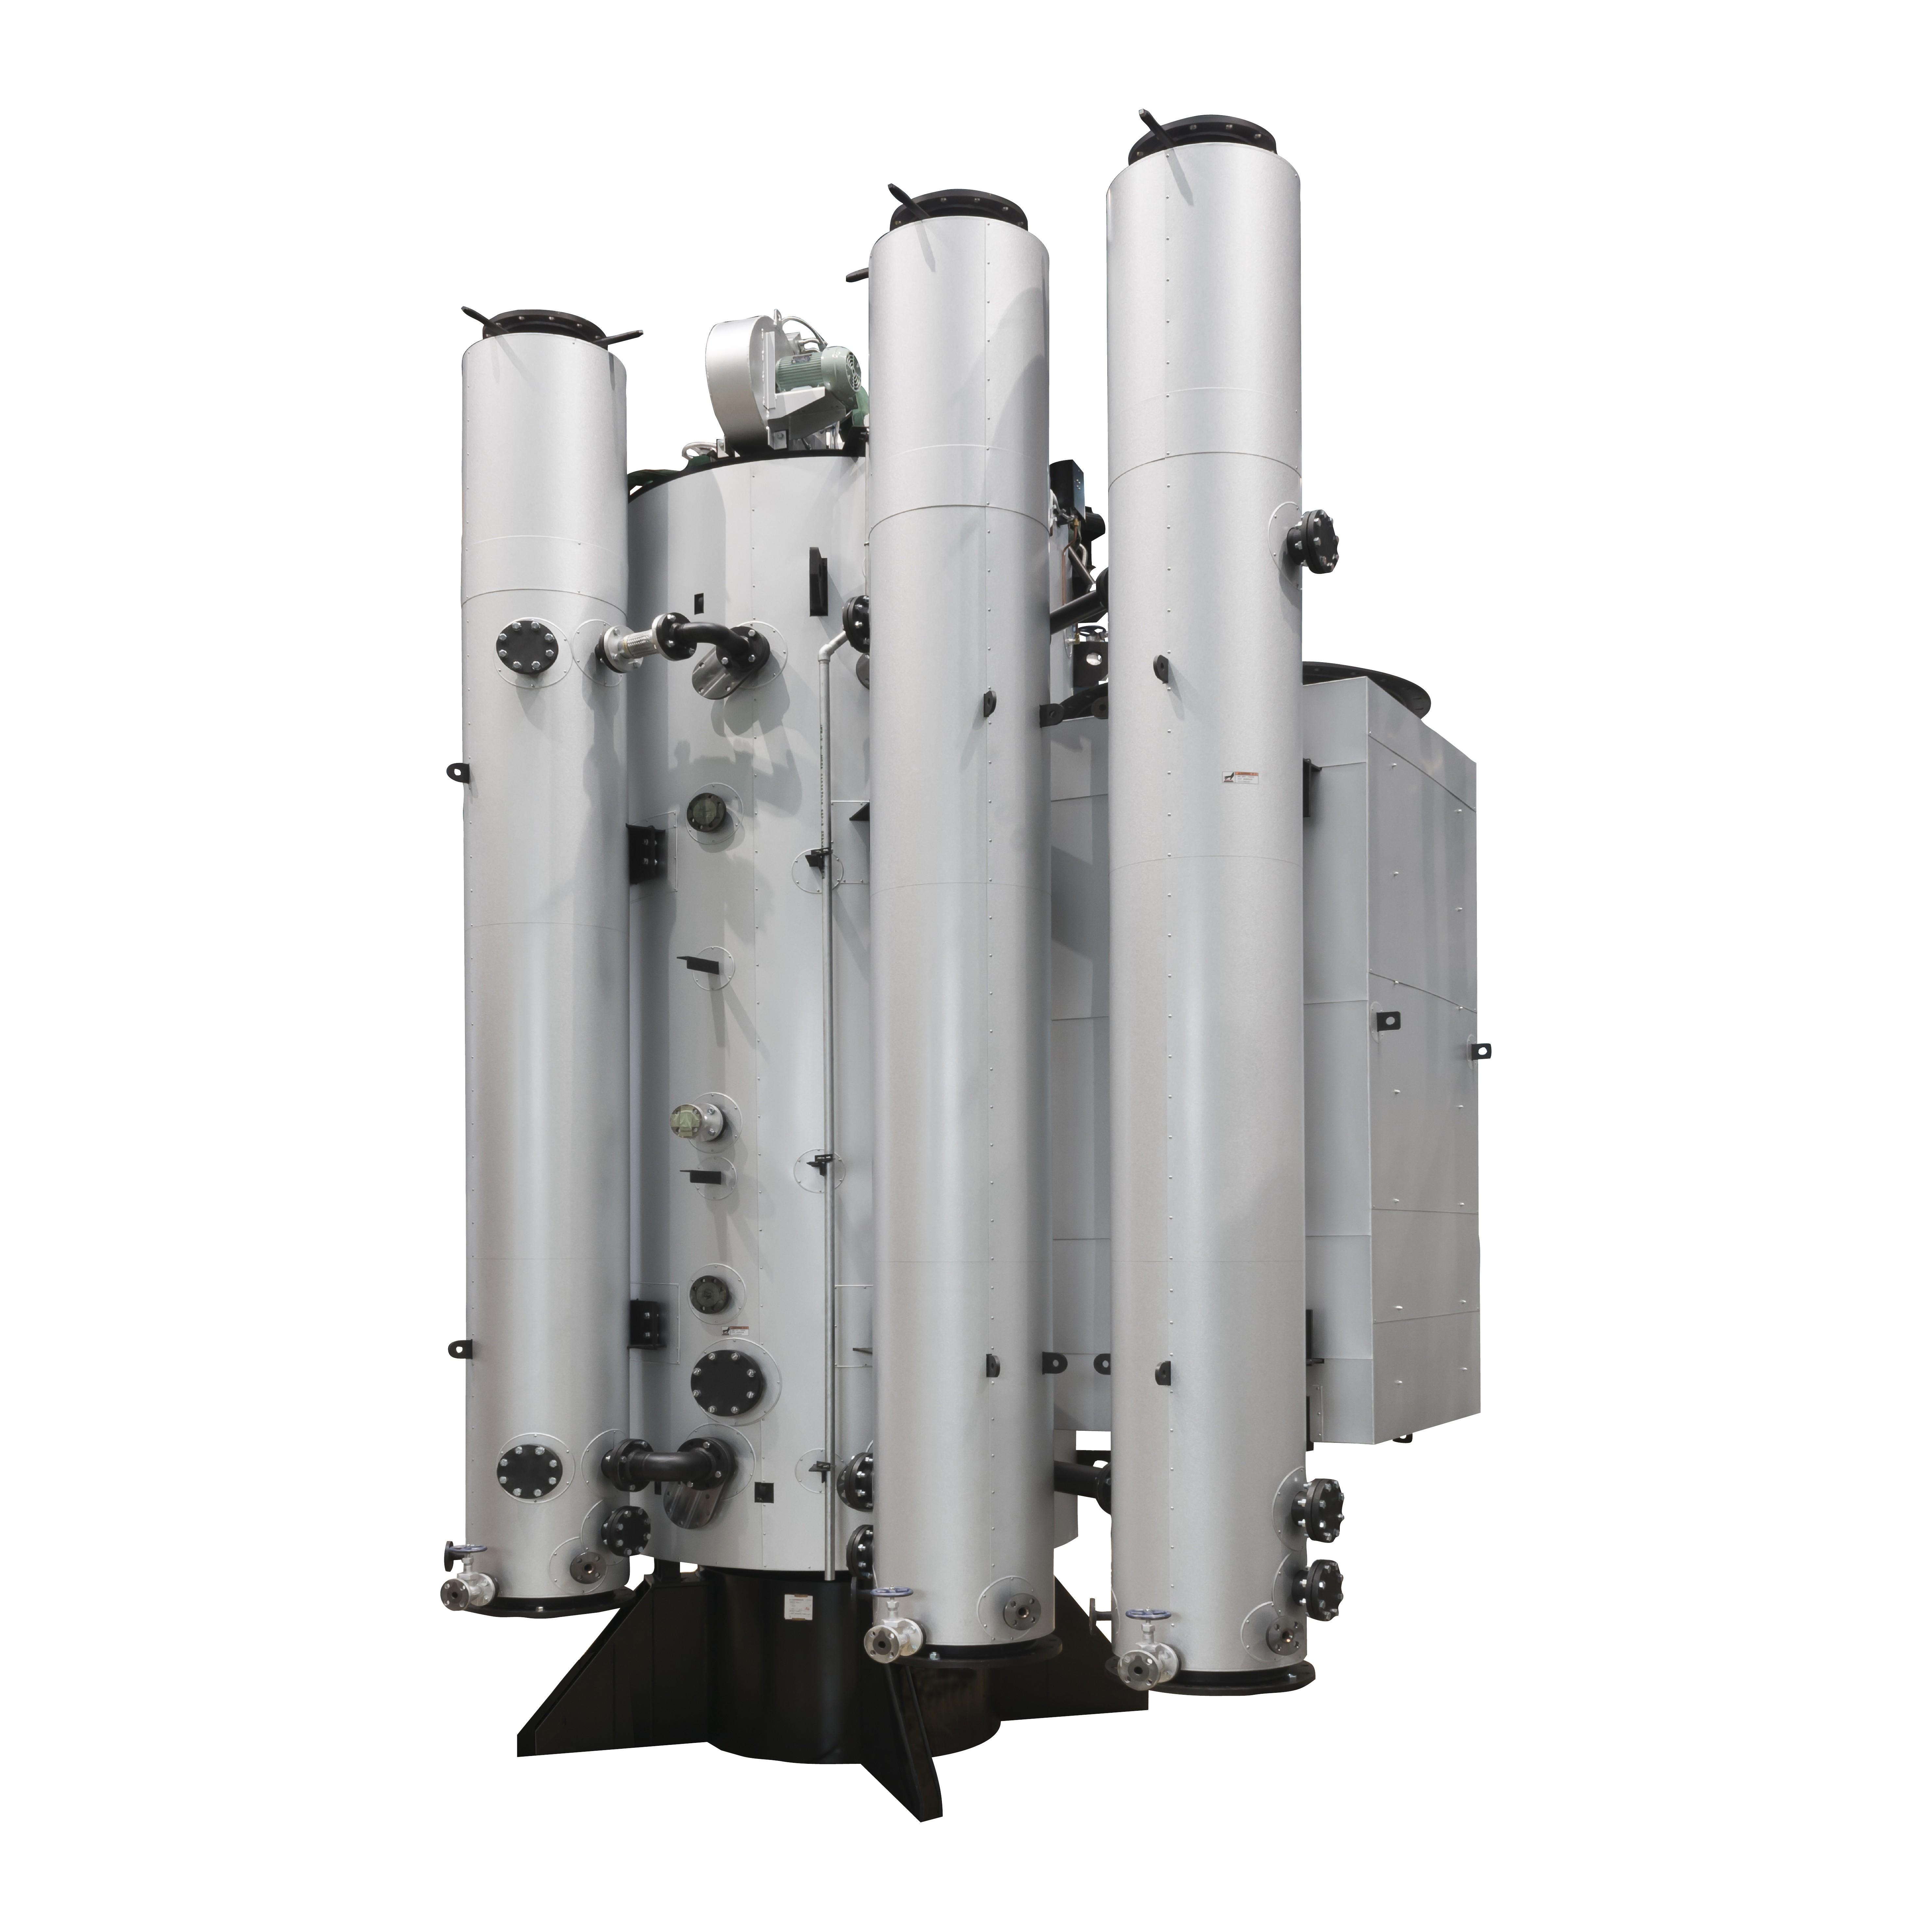 Generator engine waste heat recovery unit